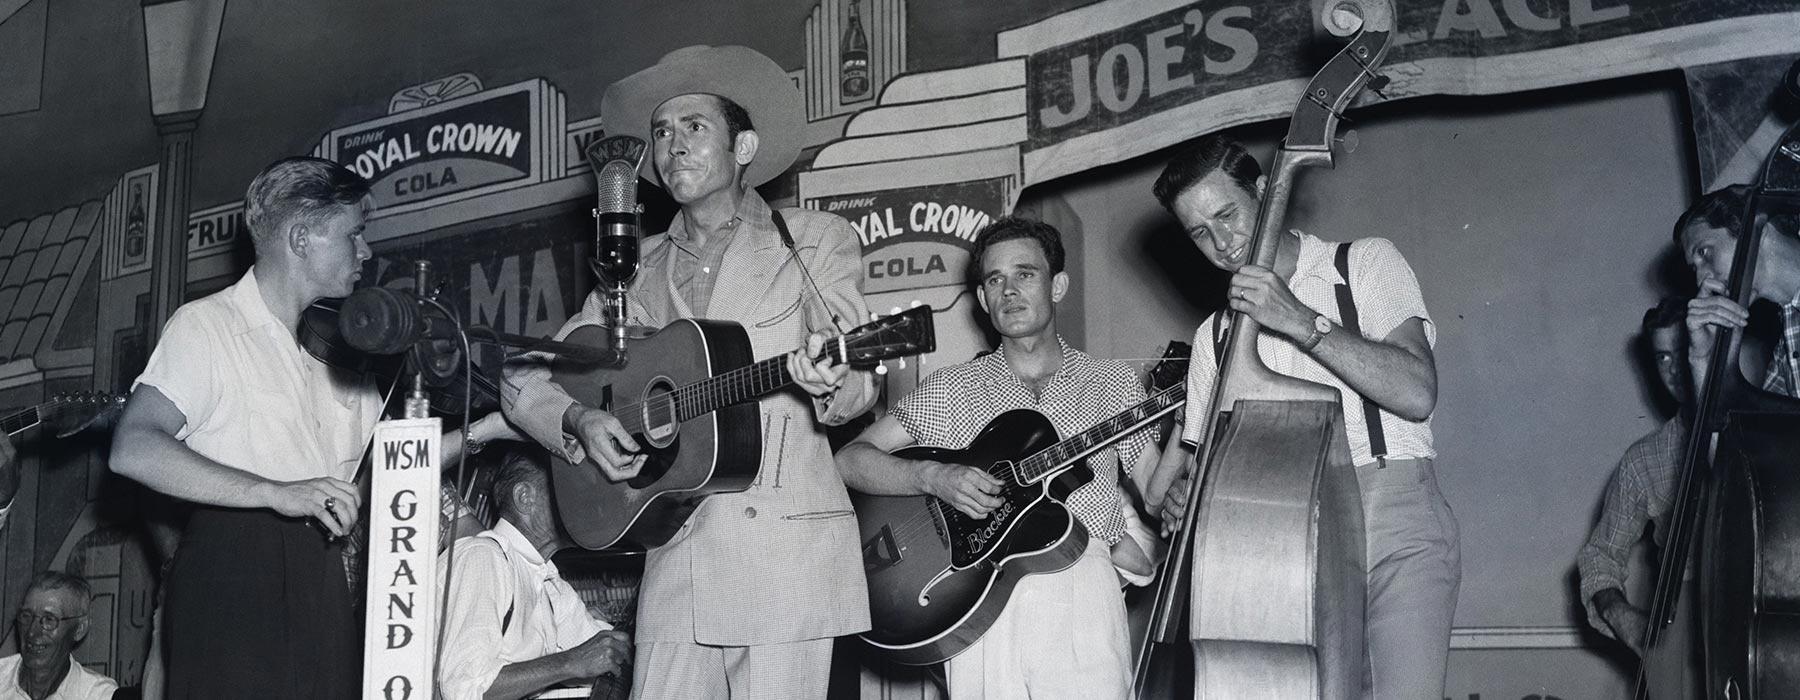 Hank Williams Ken Burns Country Music on NPT